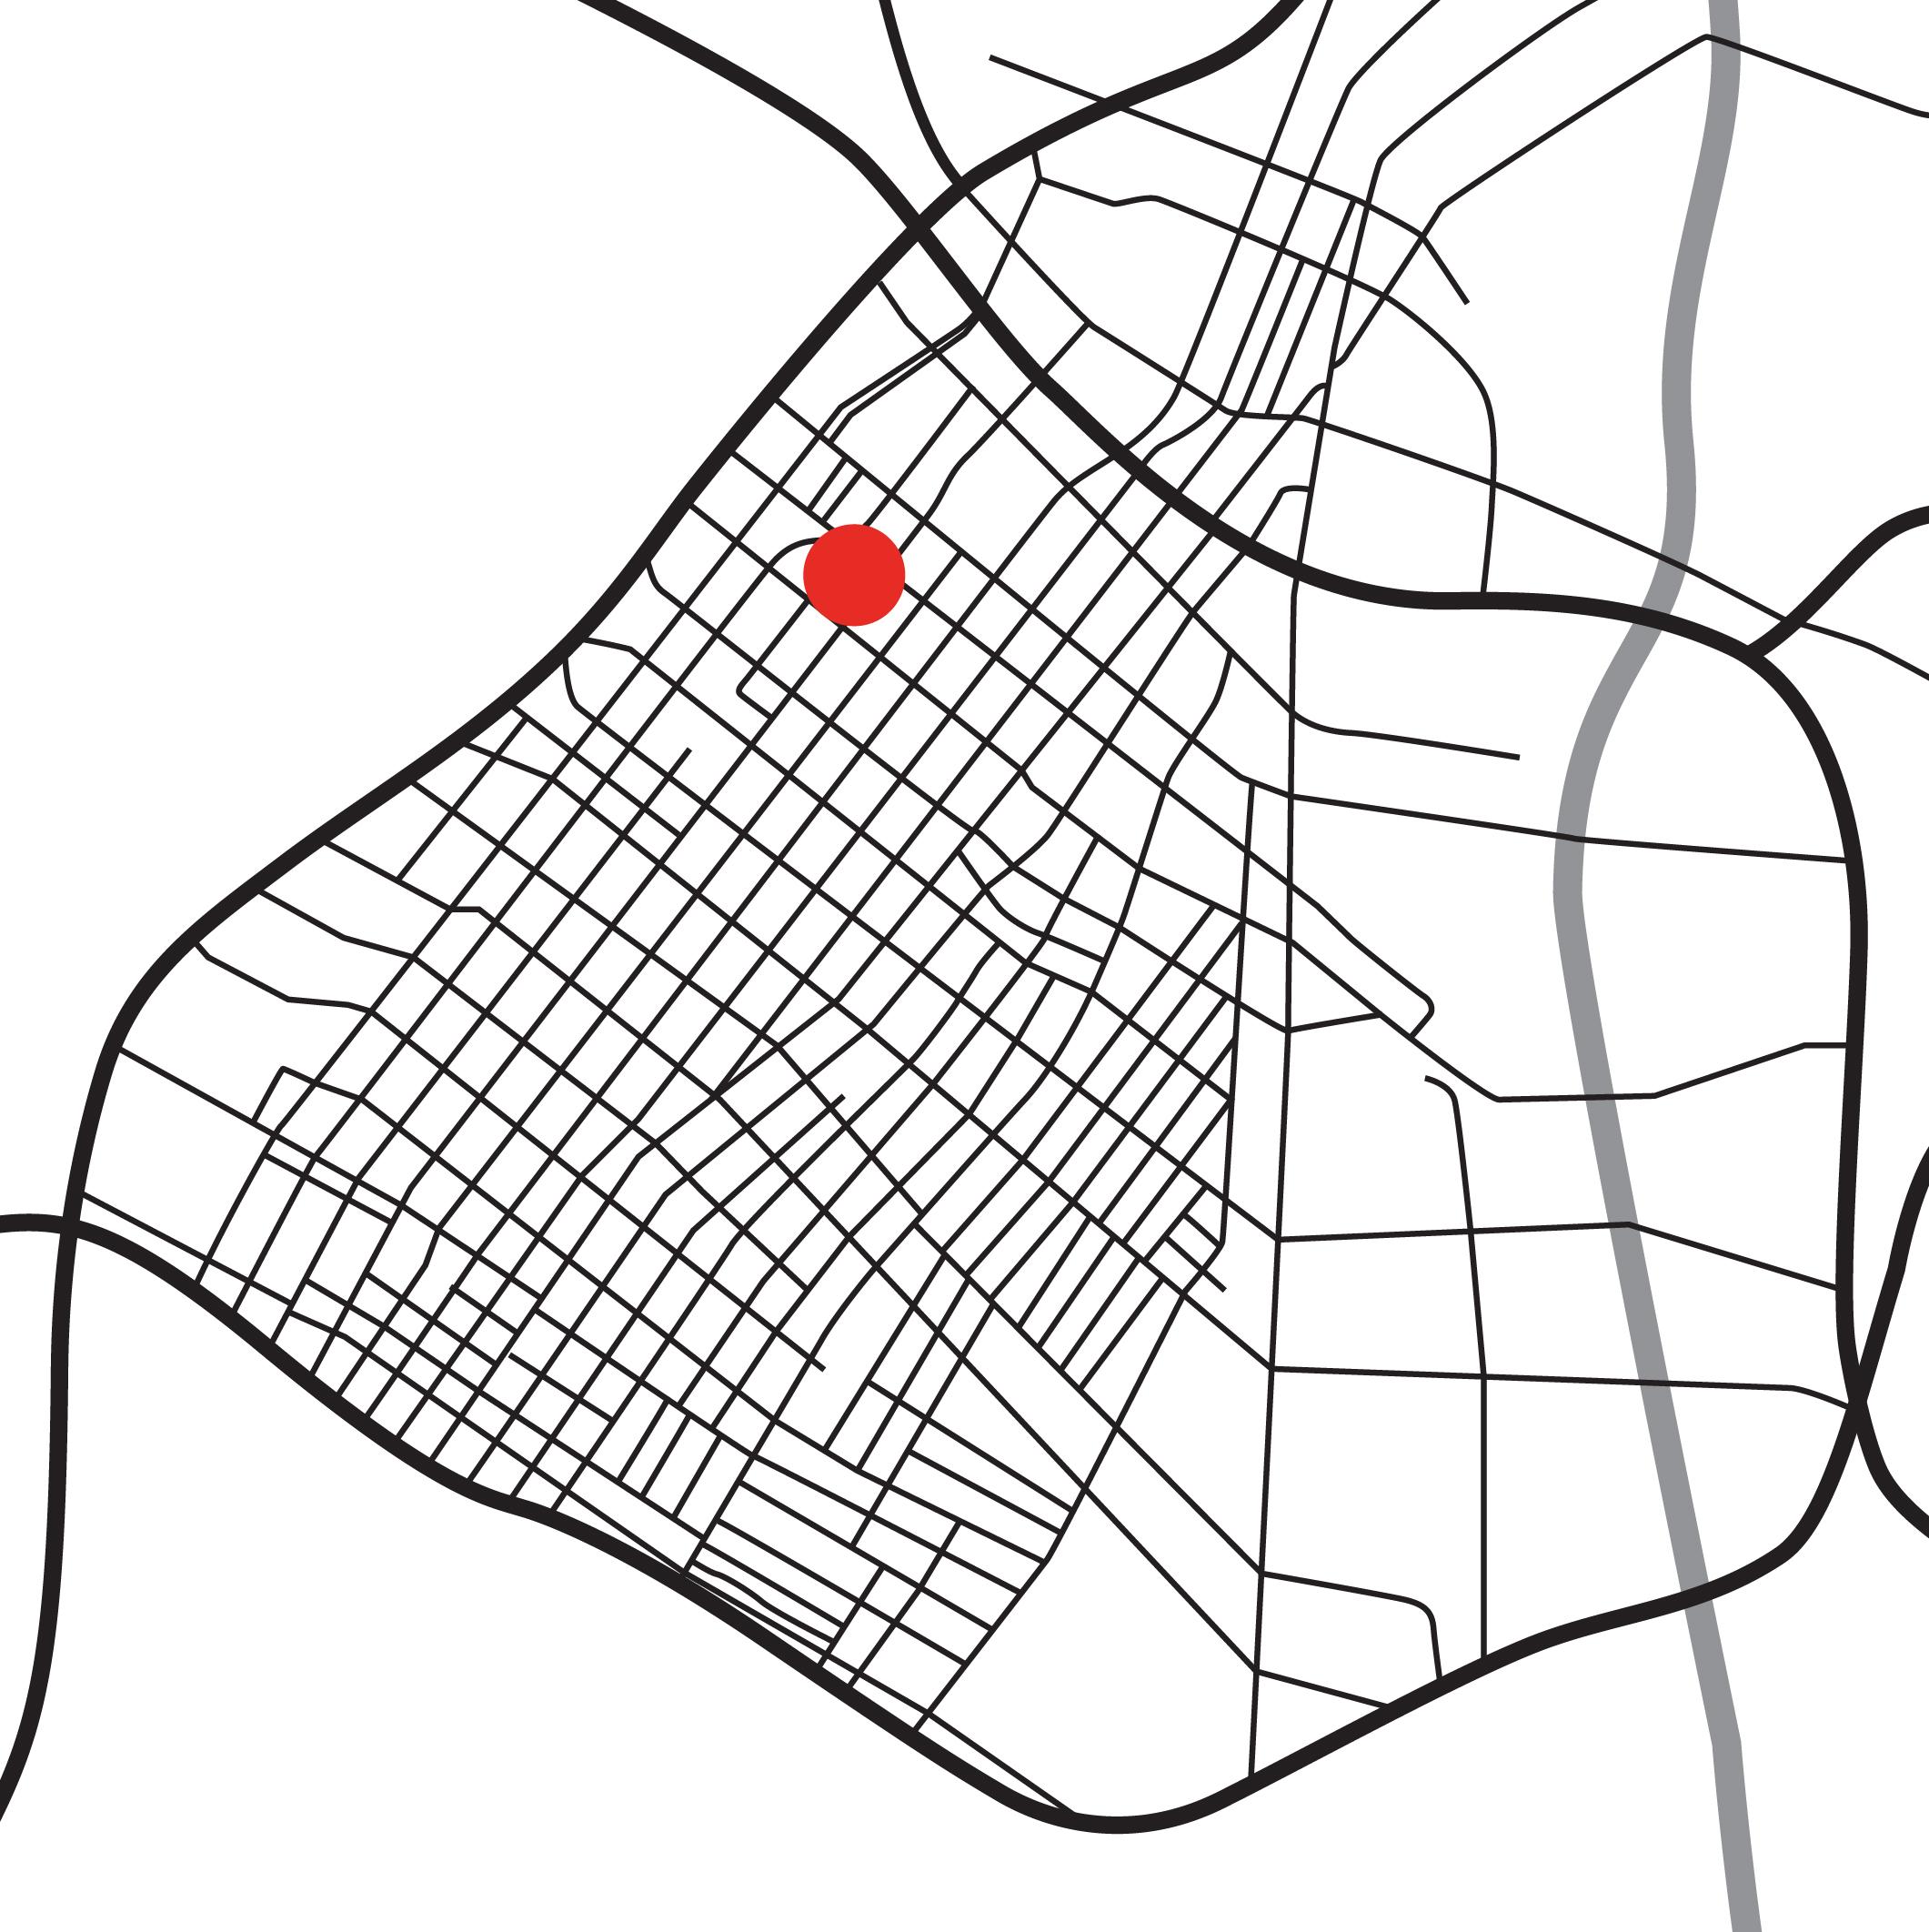 DTLA_MAP_003_The Broad-01.jpg